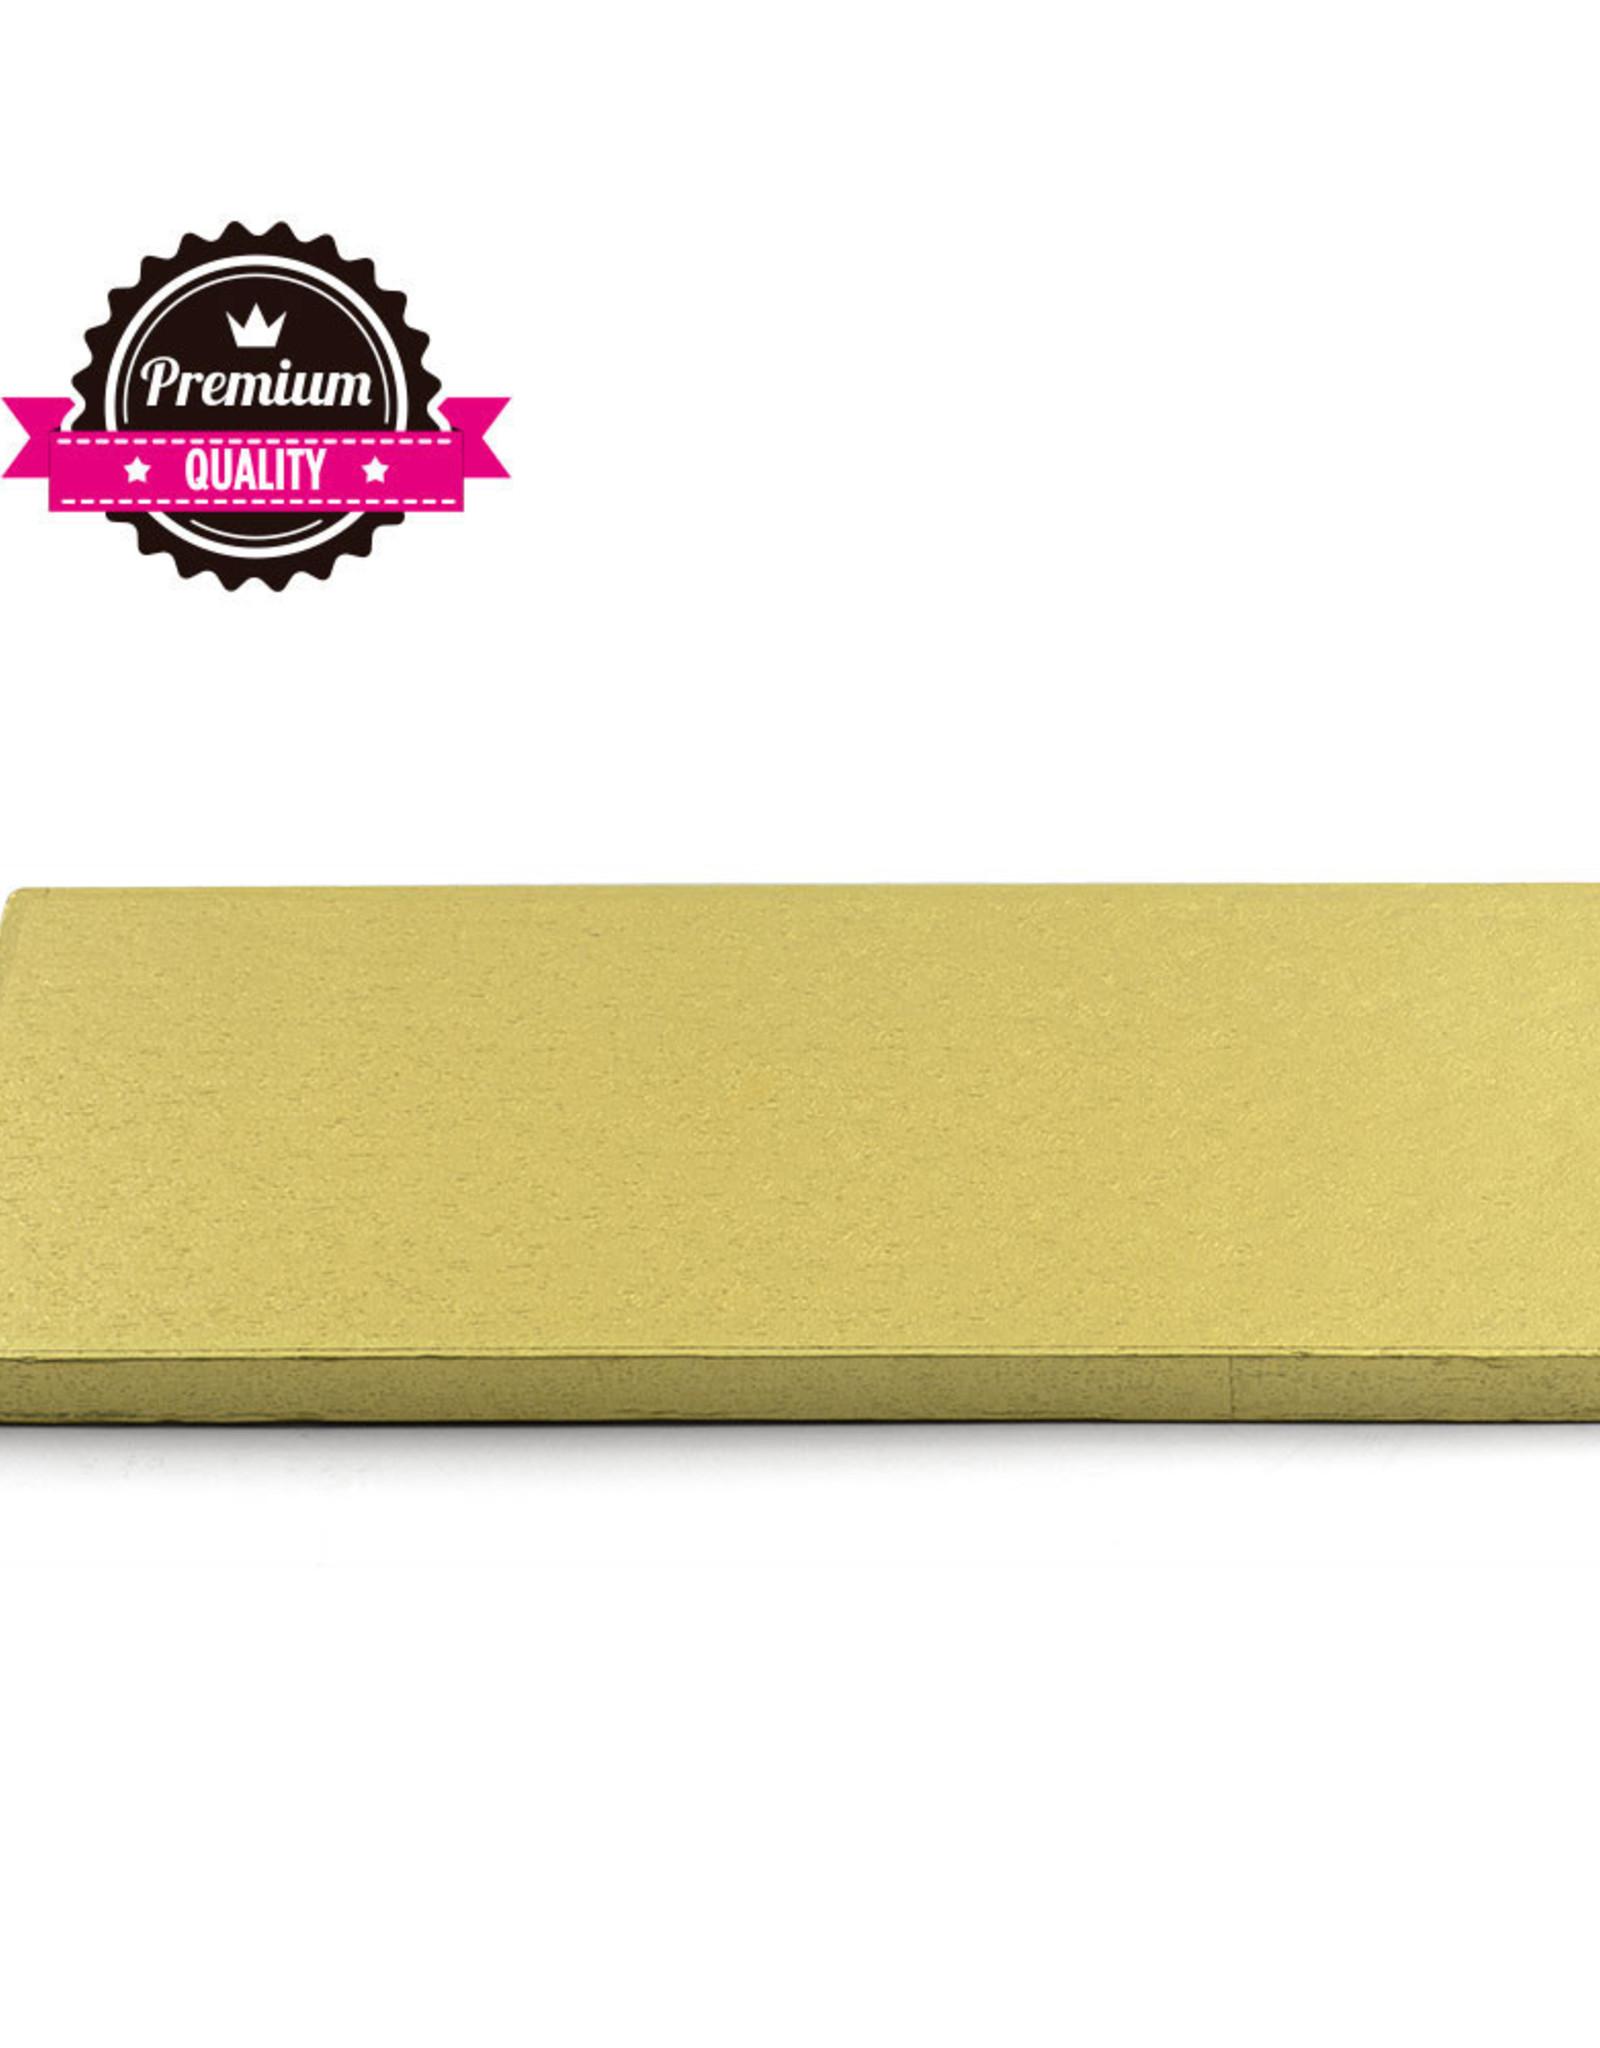 Decora Cake Drum Rechthoek 30x20cm Gold